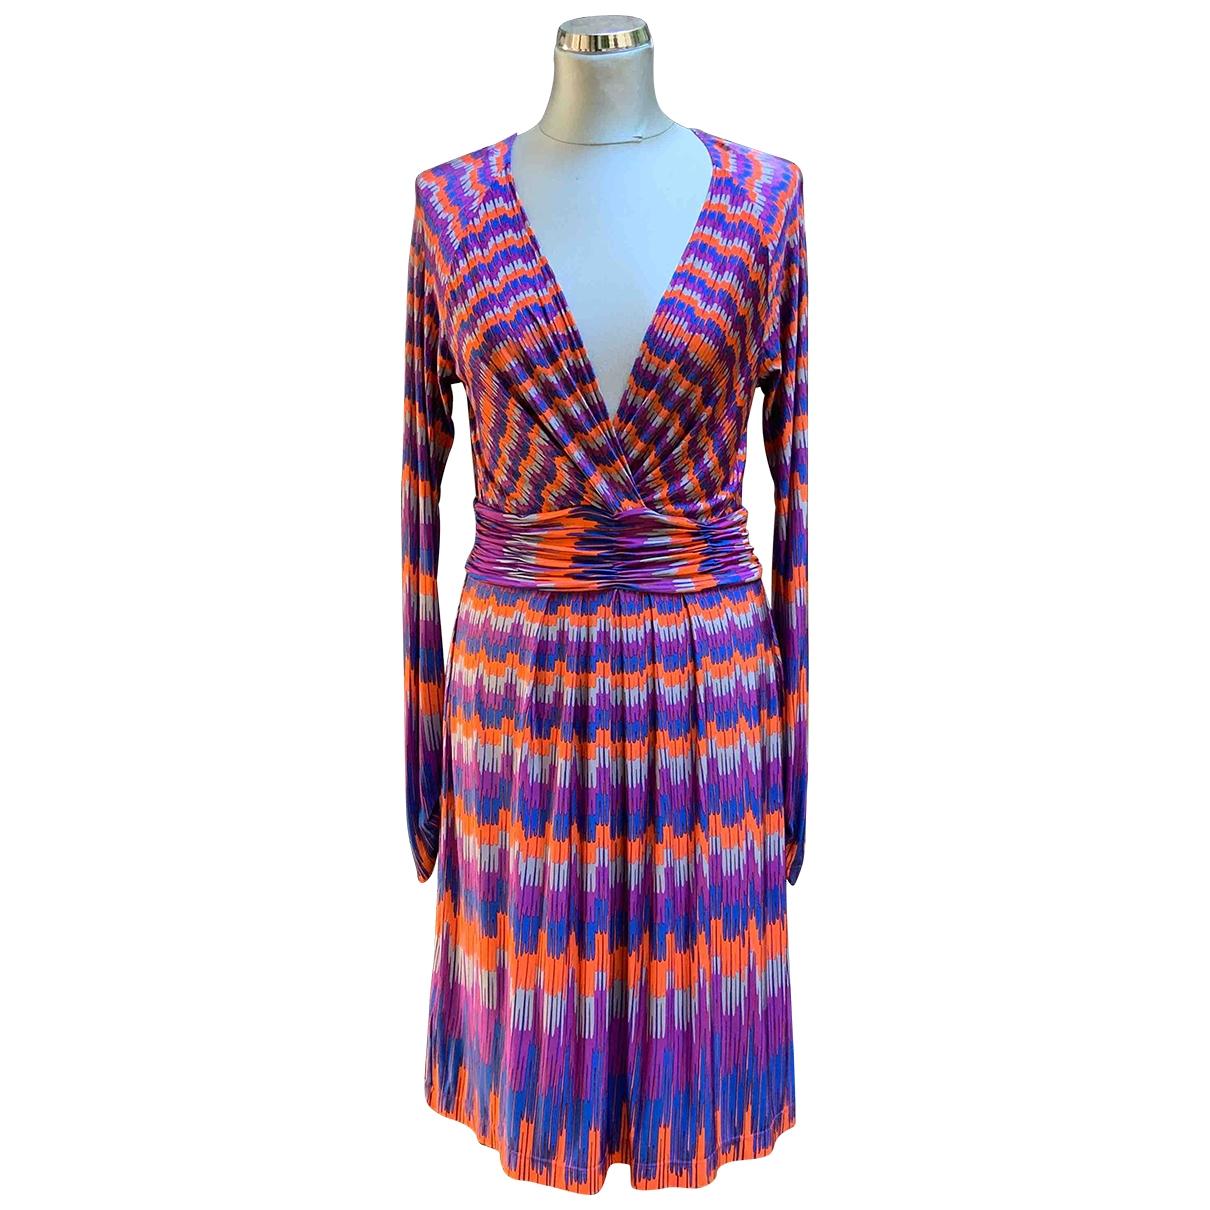 Bcbg Max Azria \N Multicolour dress for Women M International